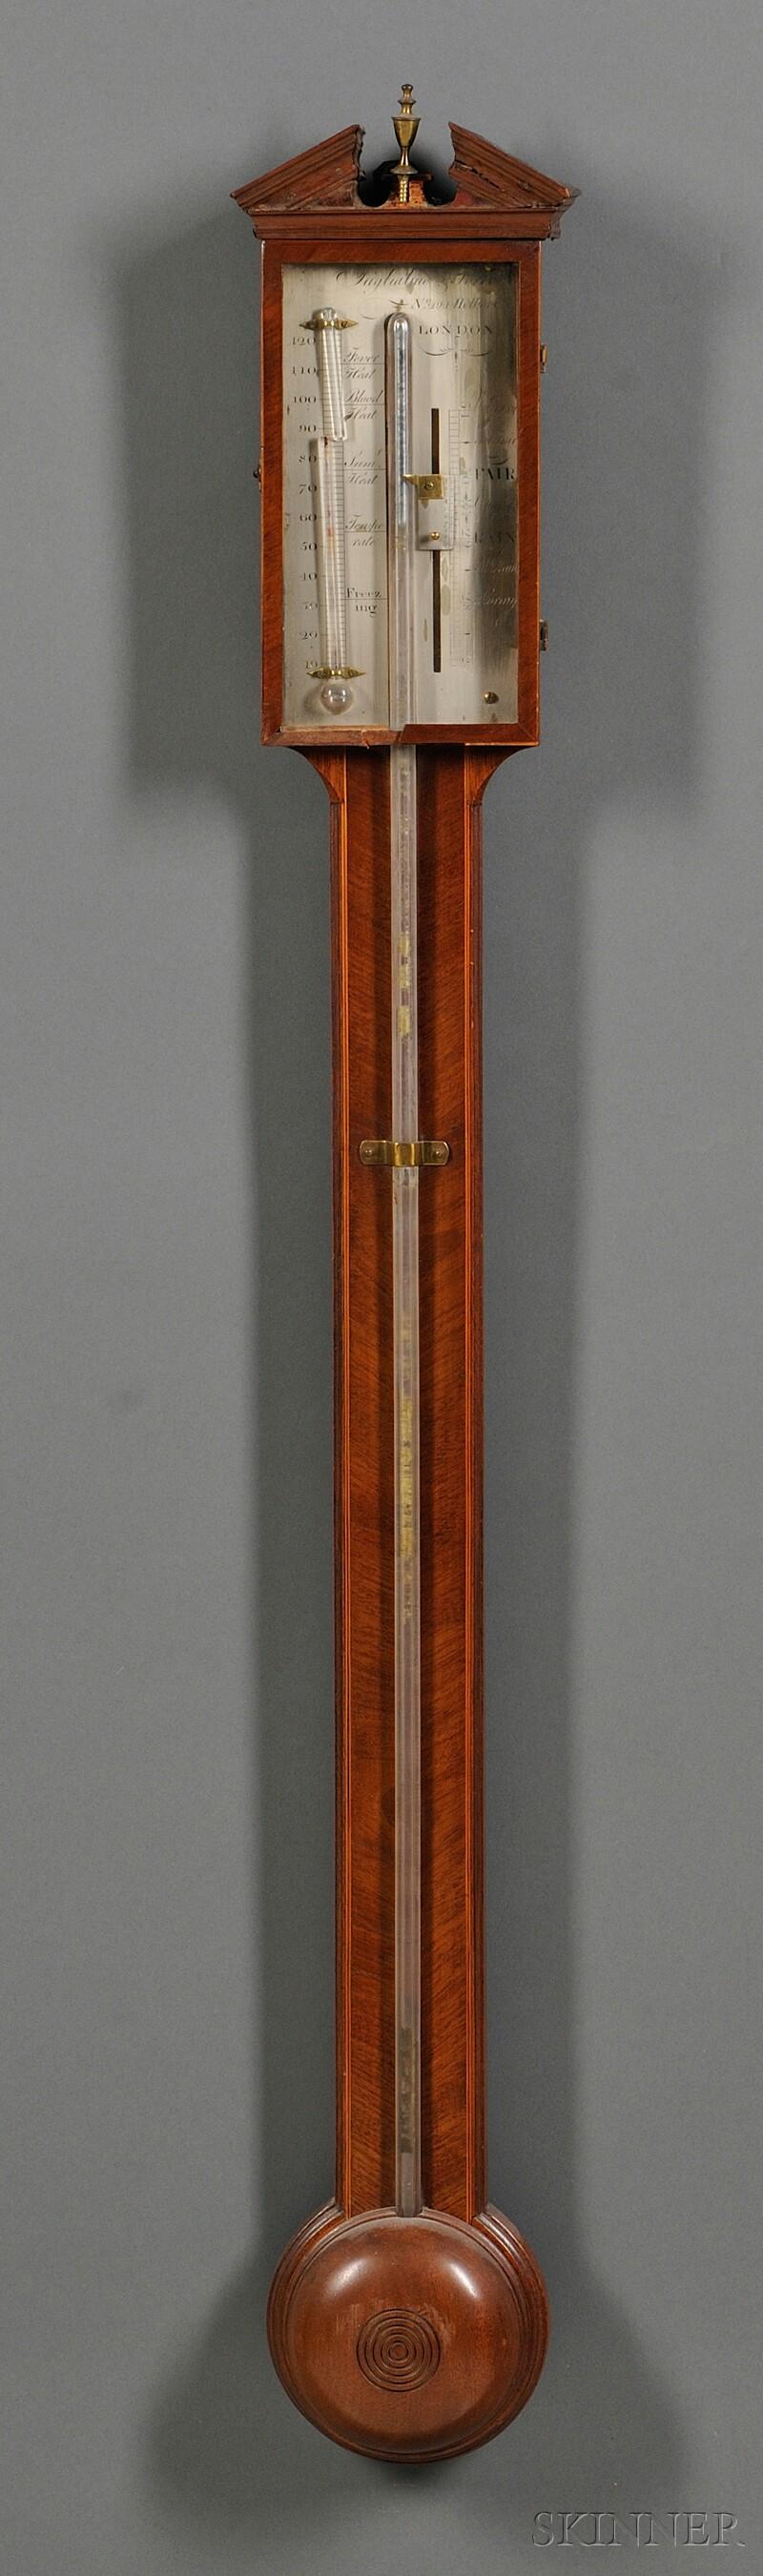 Tagliabue, Torre & Co. Satinwood-inlaid Mahogany Stick Barometer